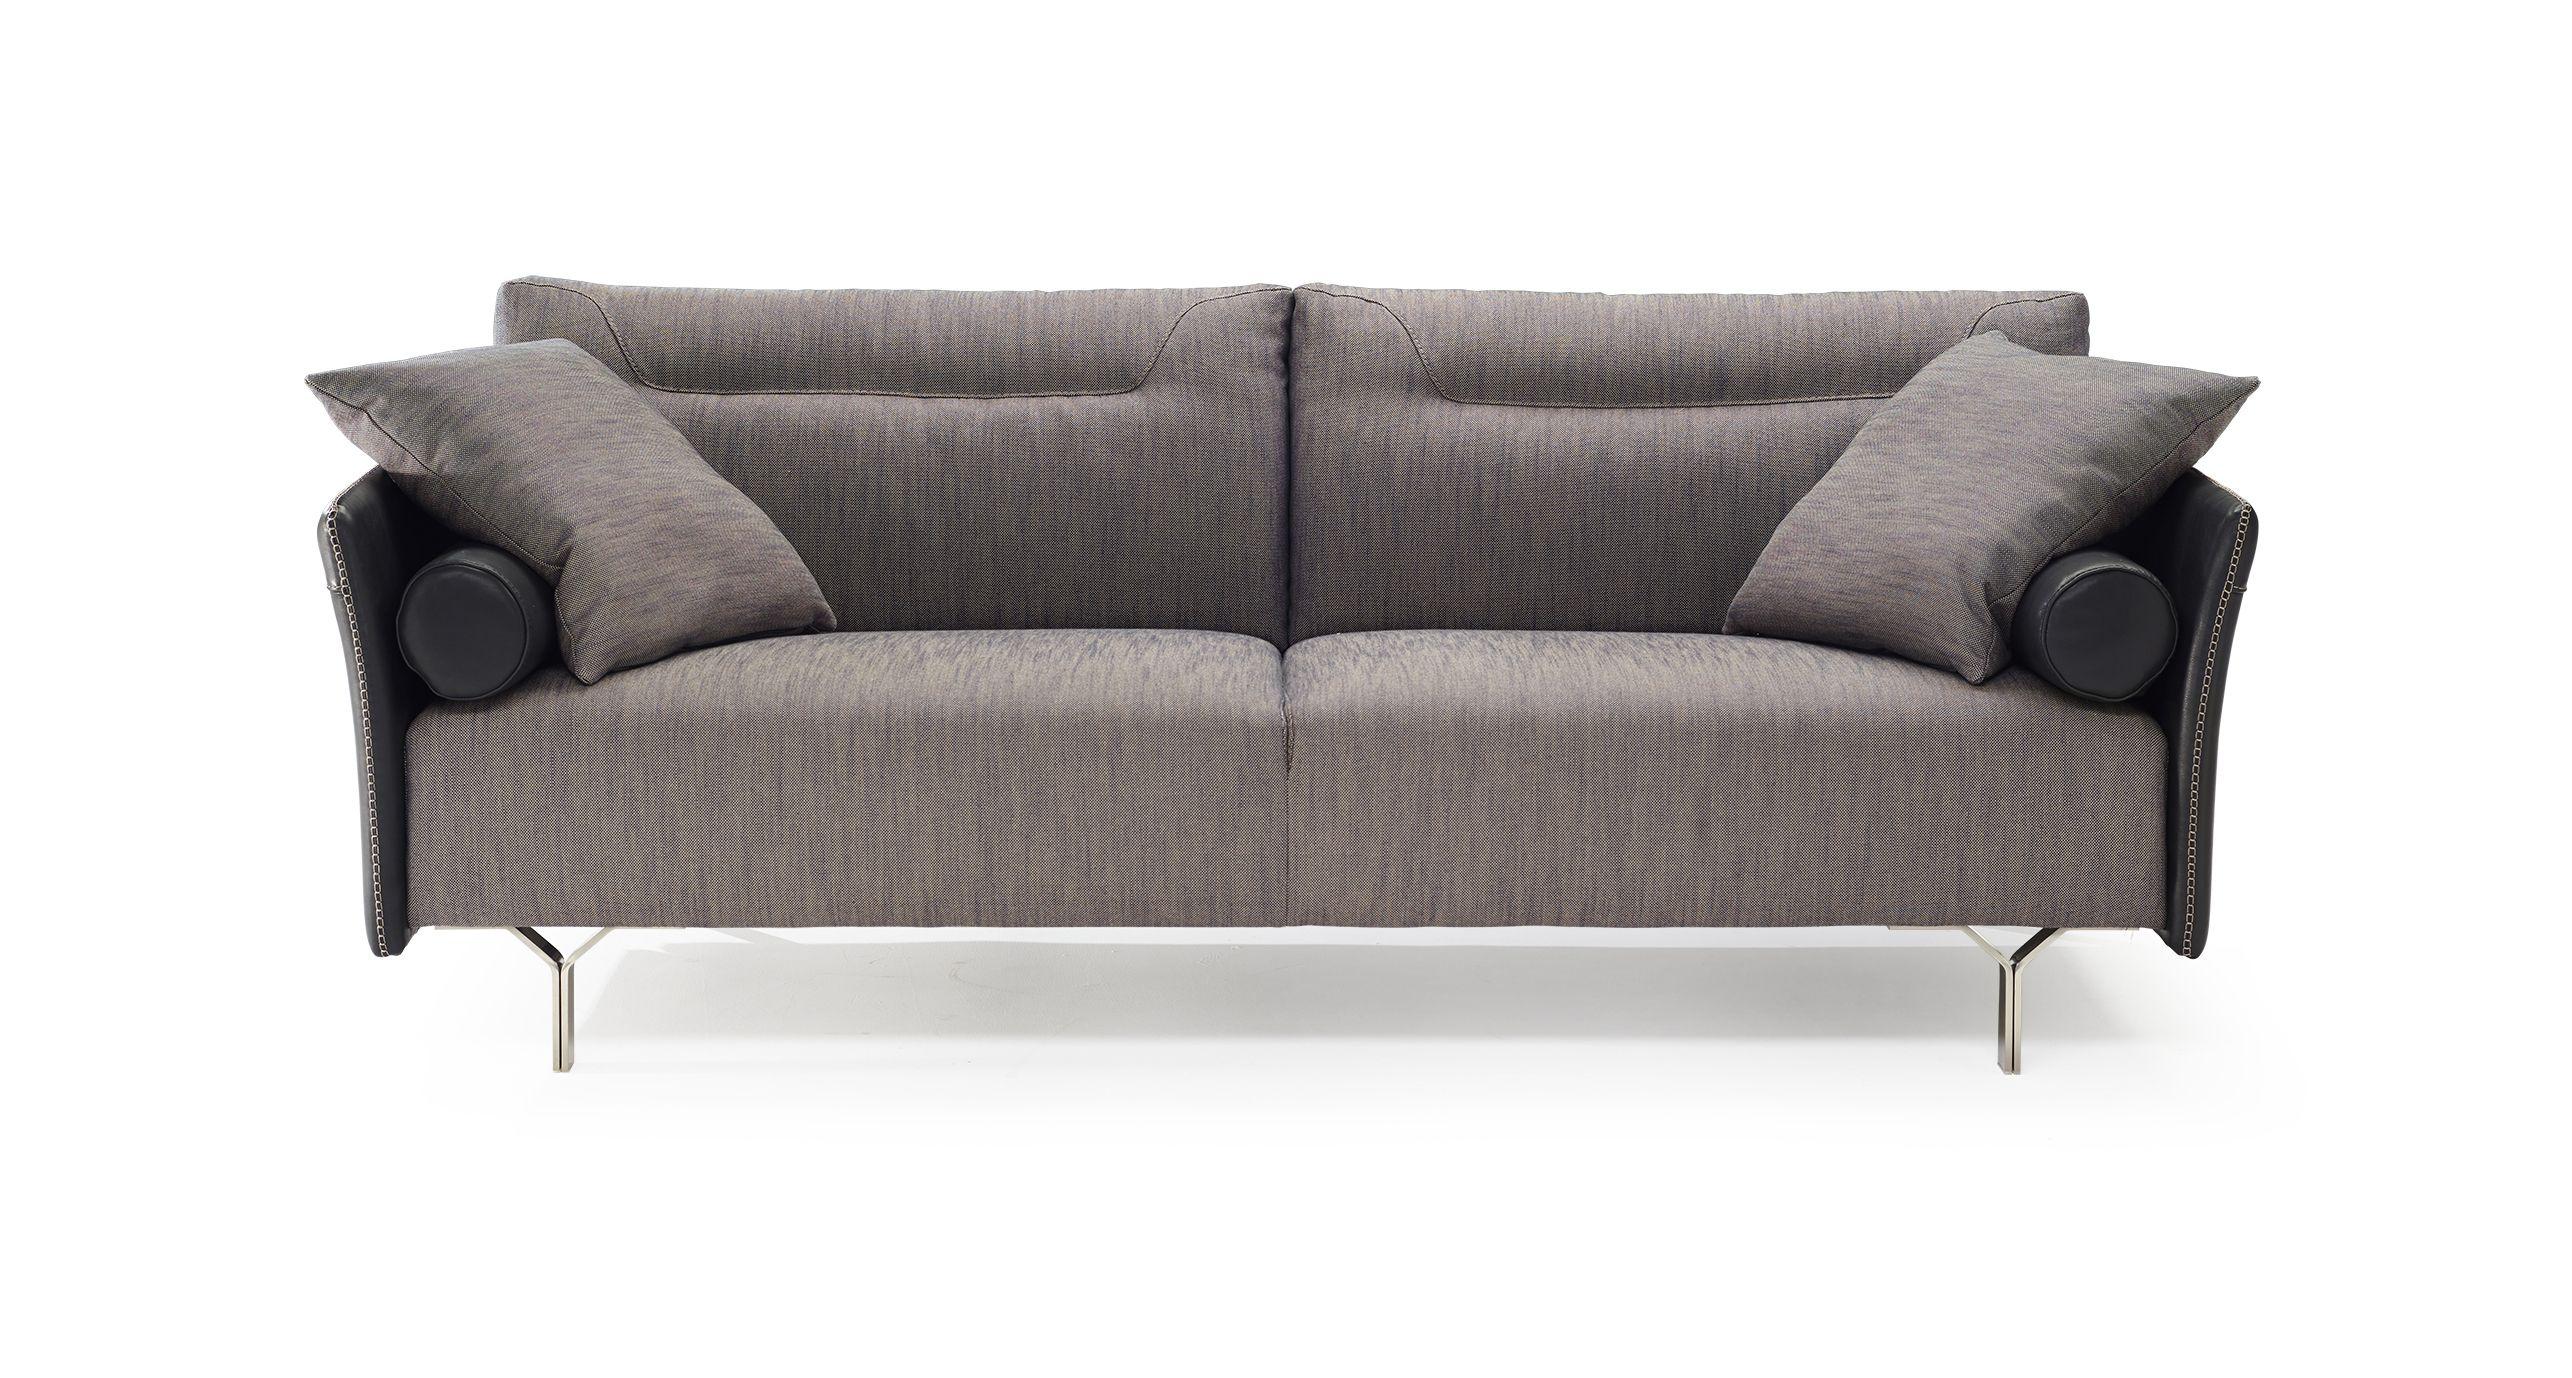 Attractive Tenore Sofa 40BM   Sofas   Natuzzi Italia | Modern Furniture Store  Sacramento Roseville